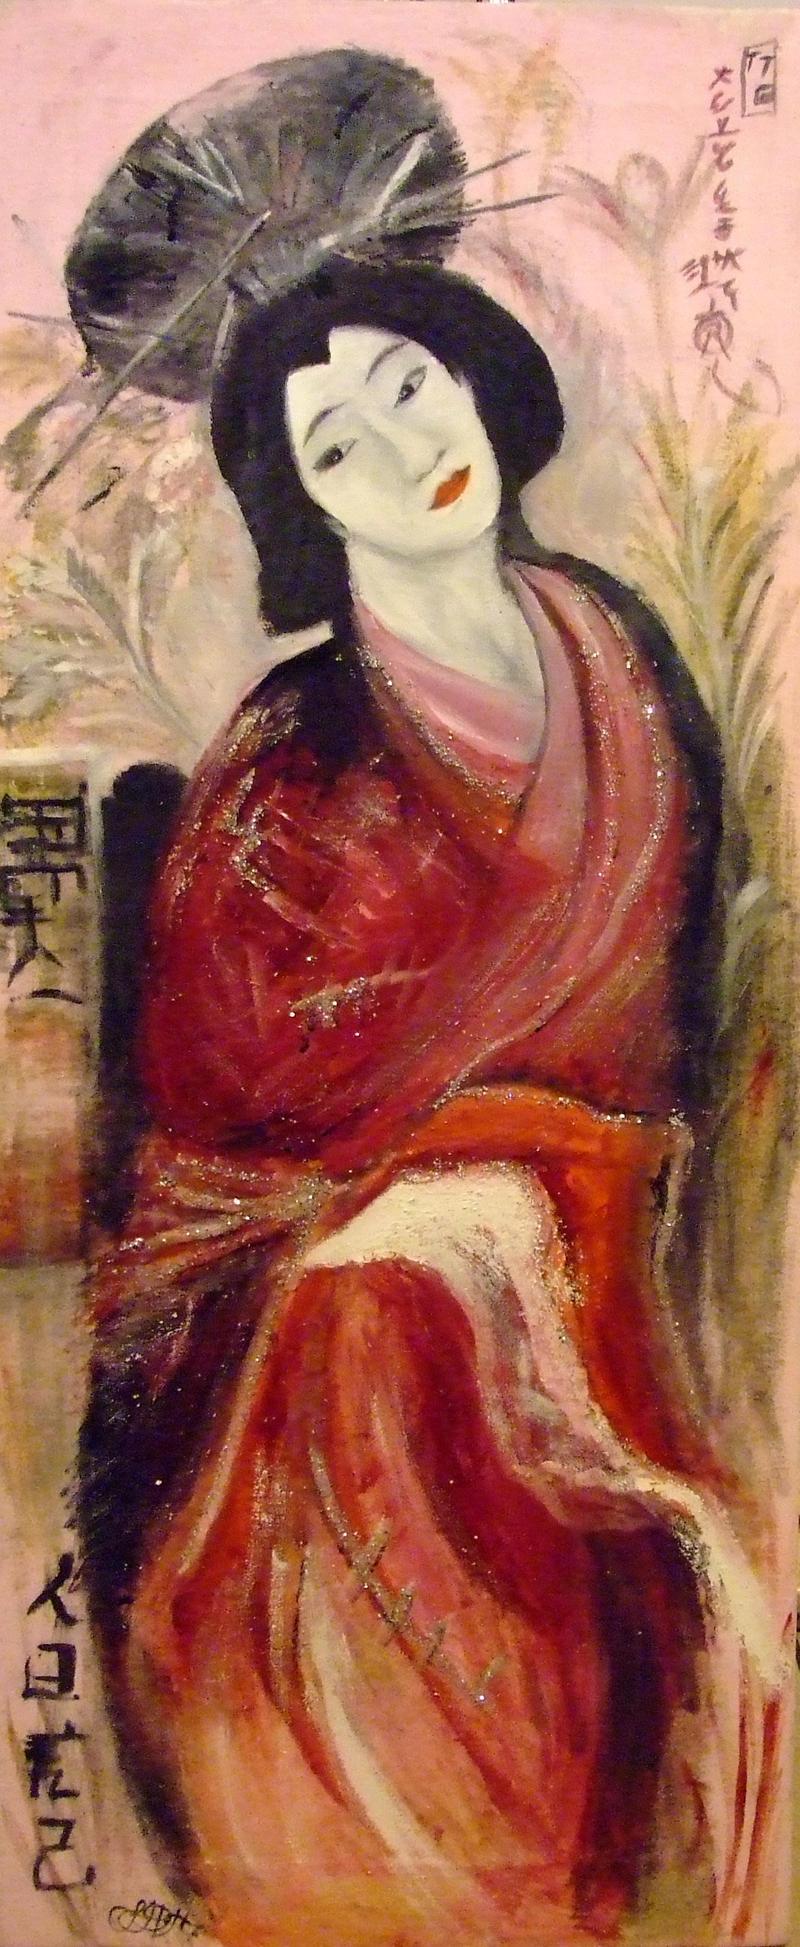 Geisha girl painting by morris